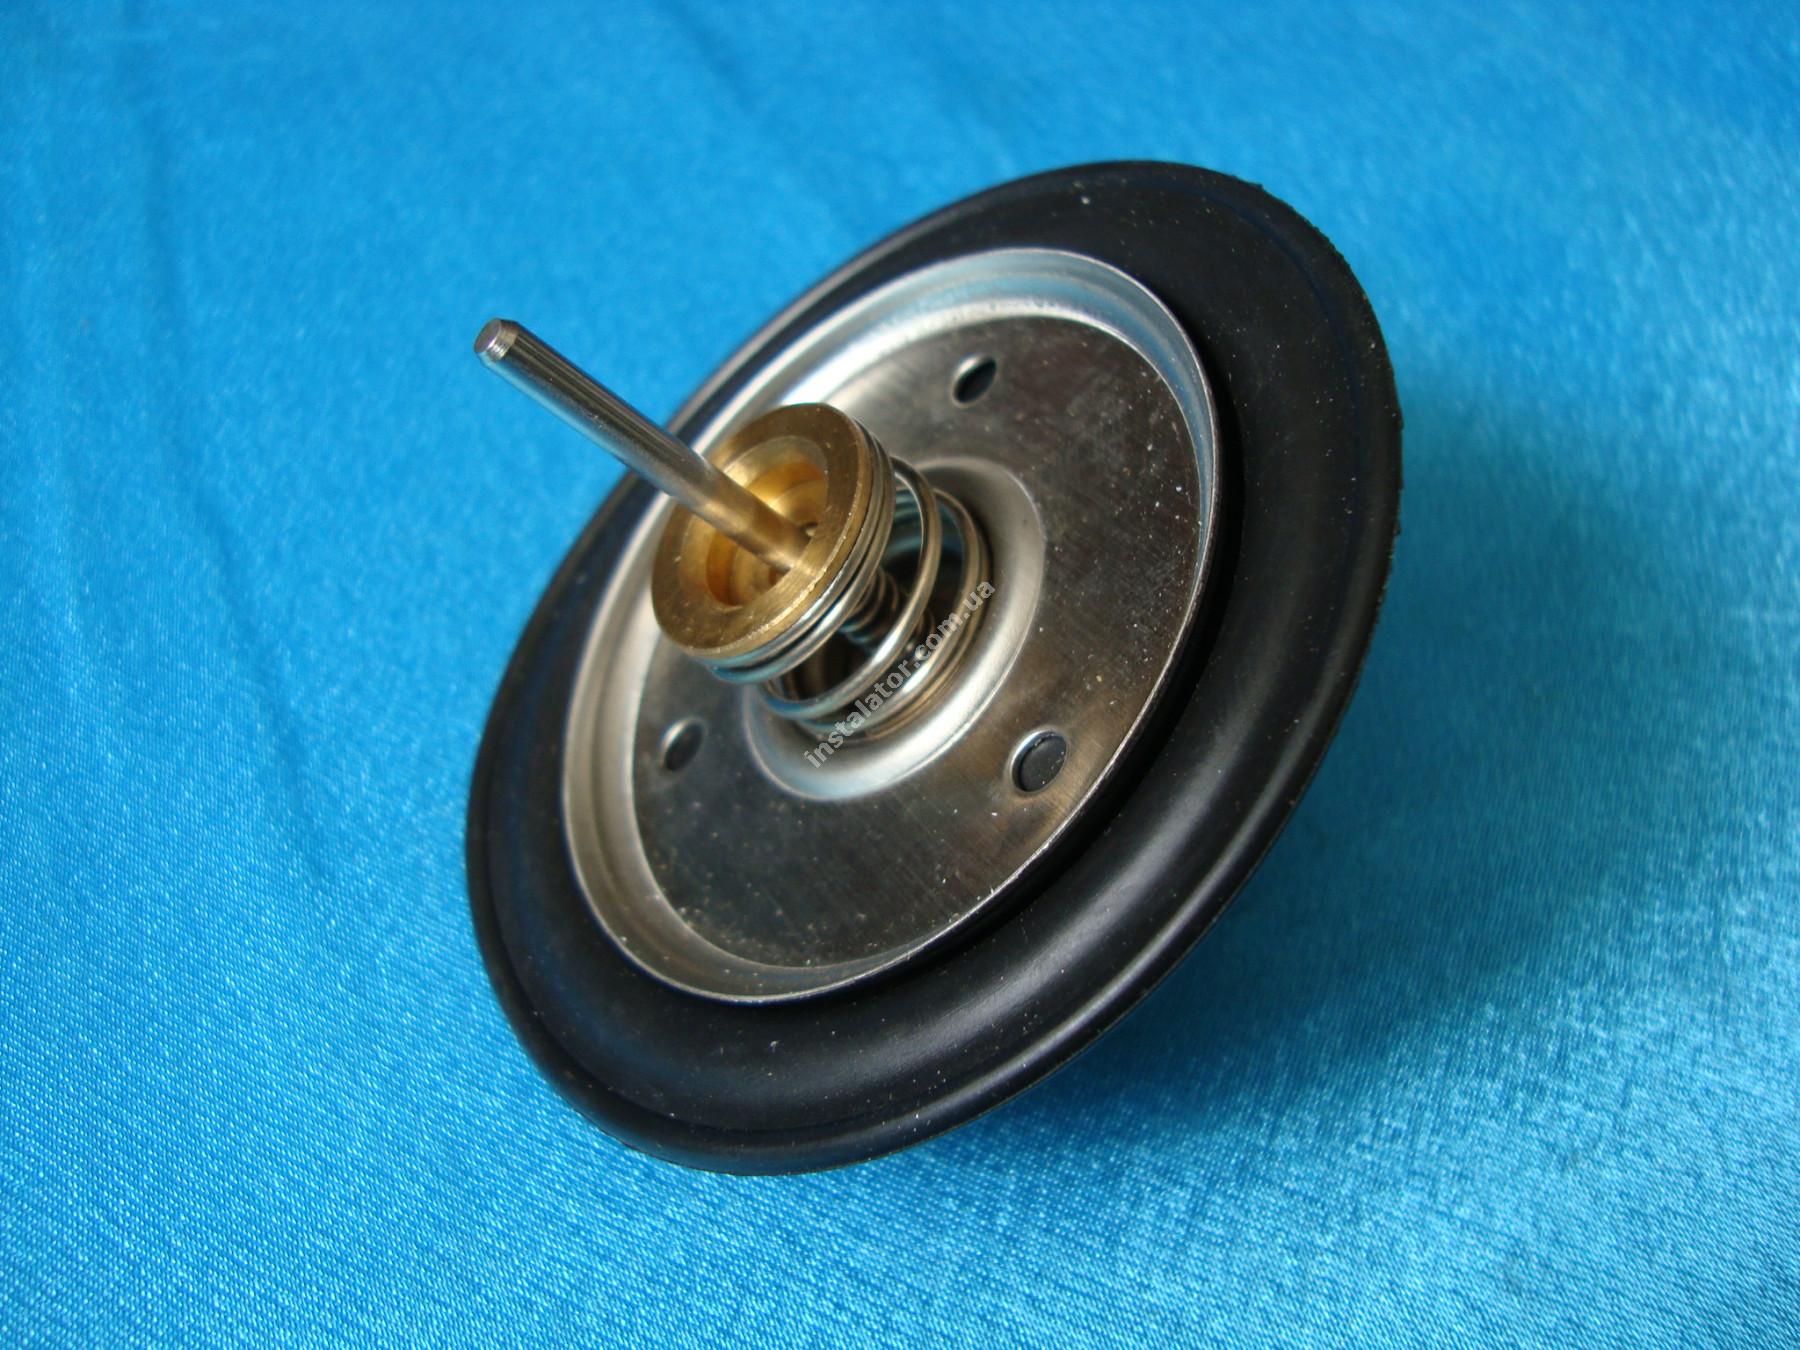 40300010 Мембрана 3-х ходового клапана зі штоком Hermann Micra (аналог) full-image-0